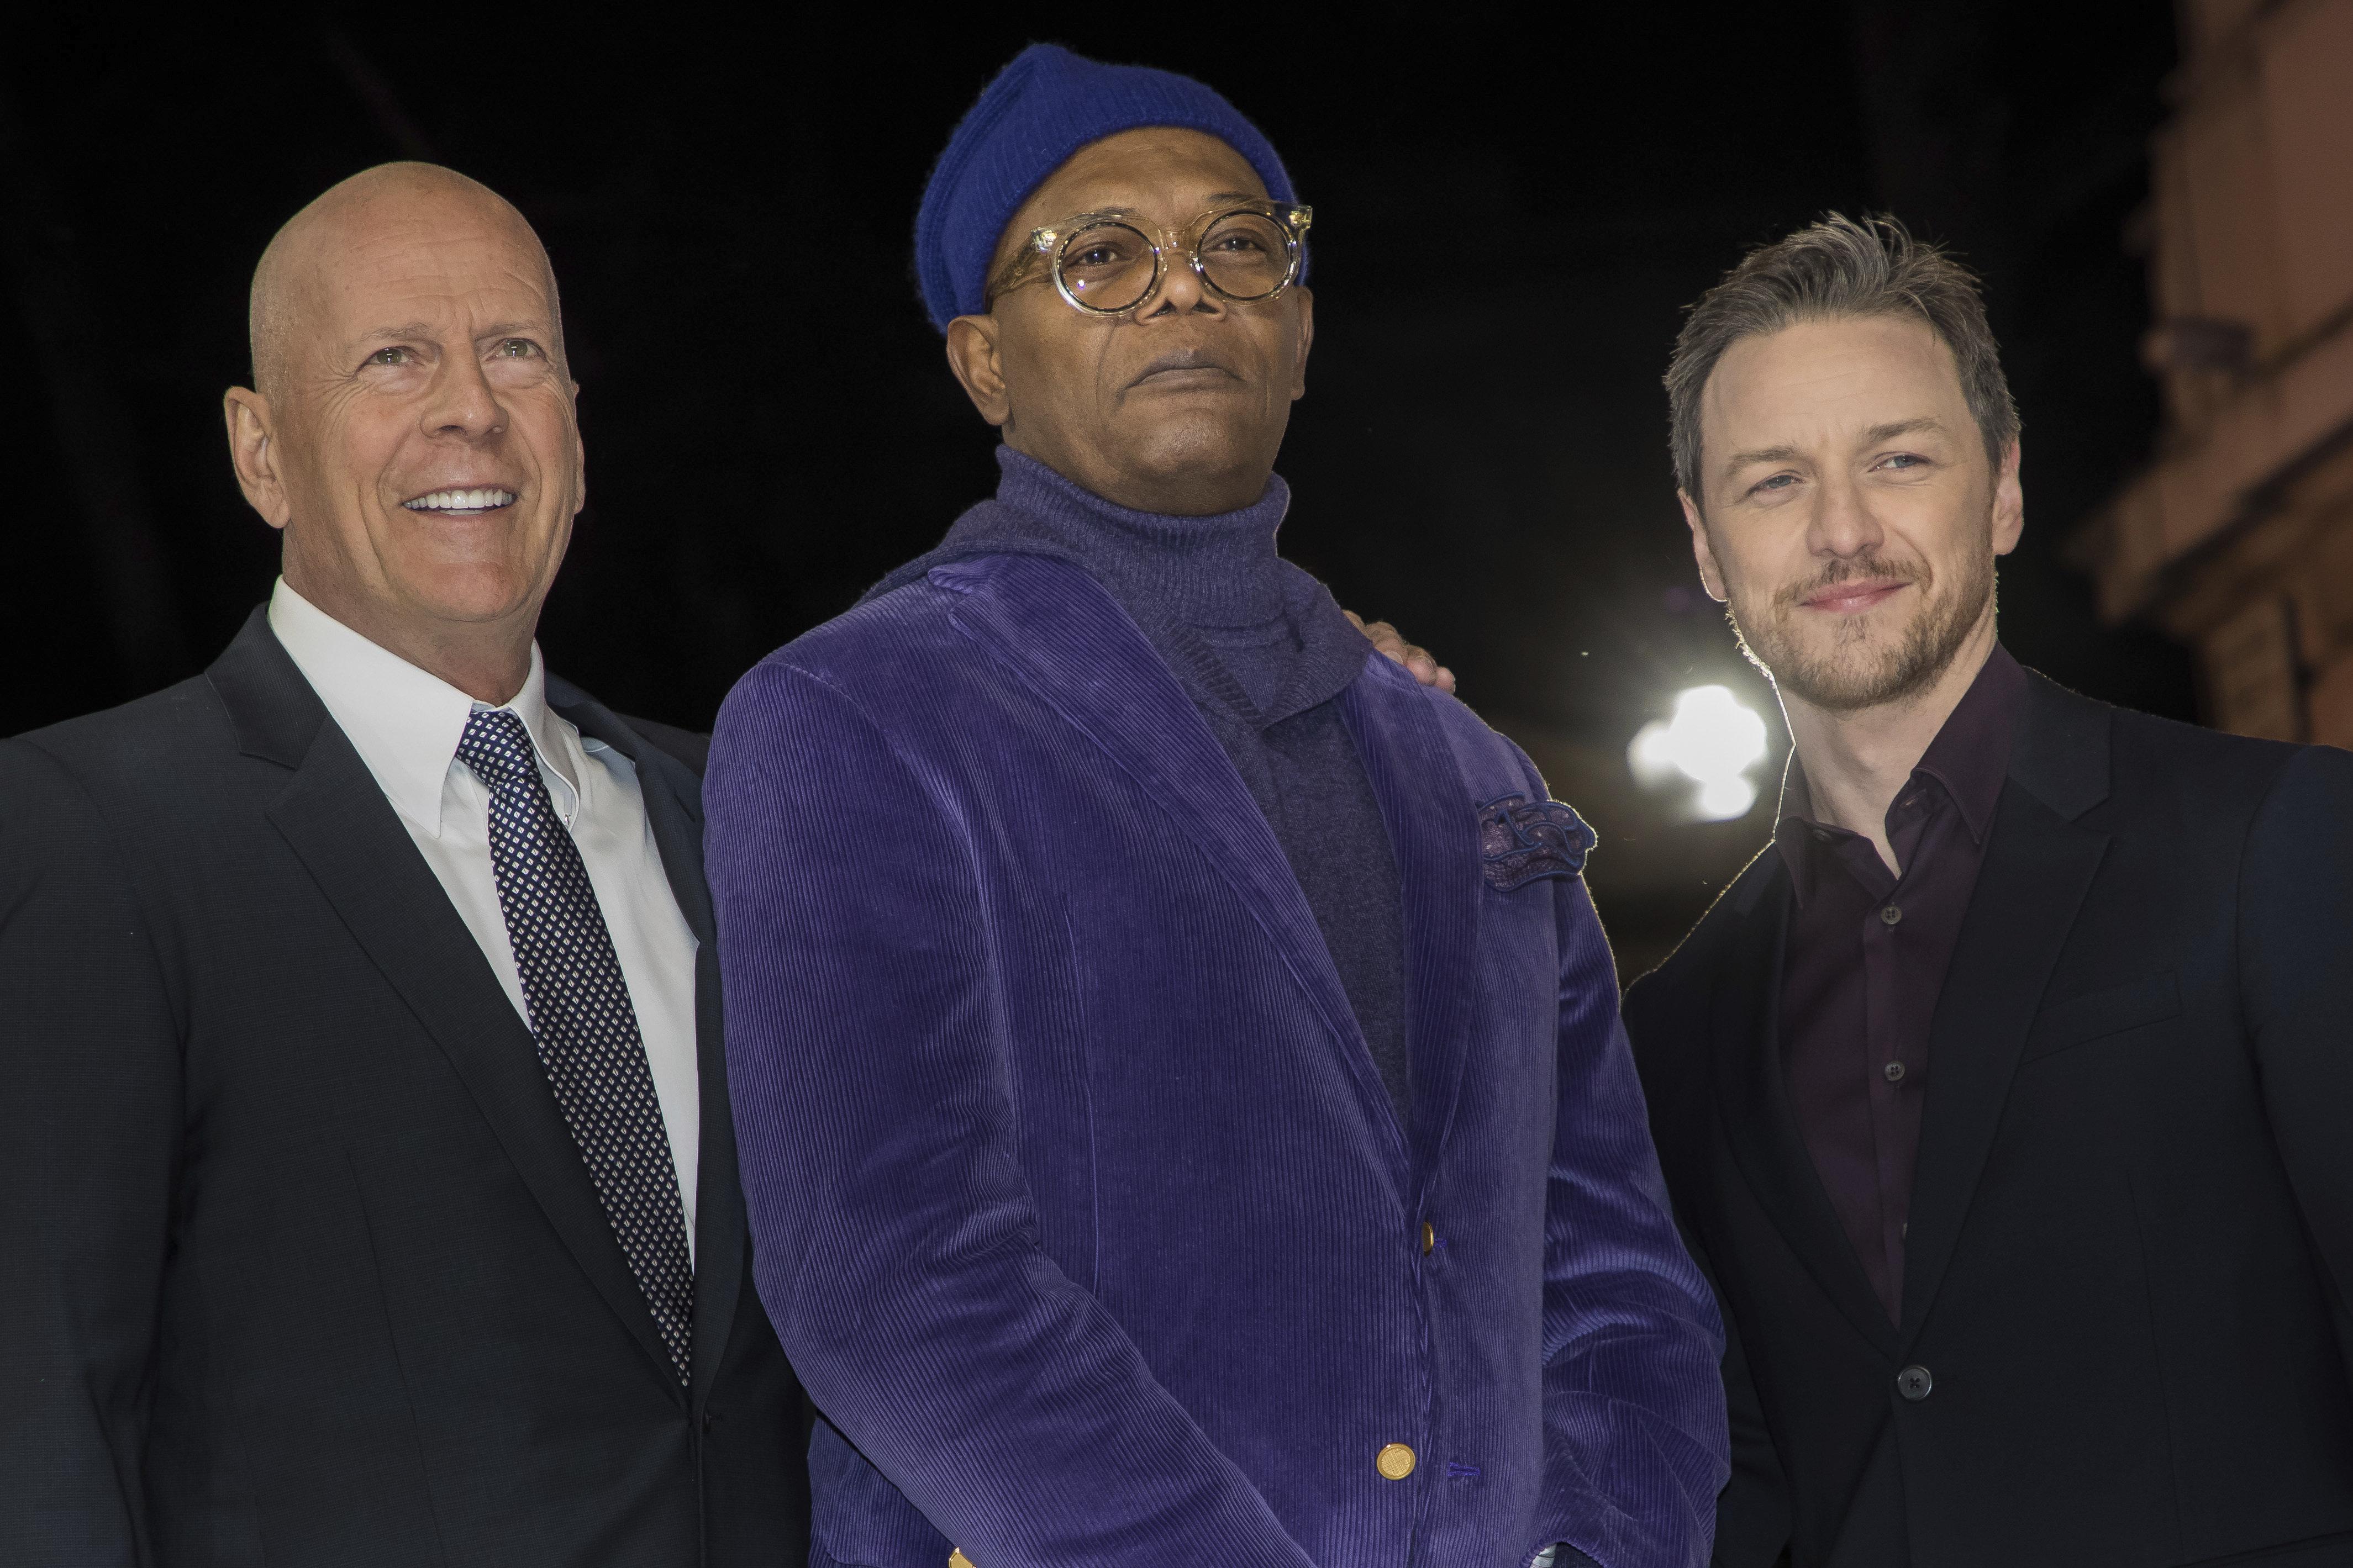 Willis, Jackson And McAvoy Attend European Premiere of